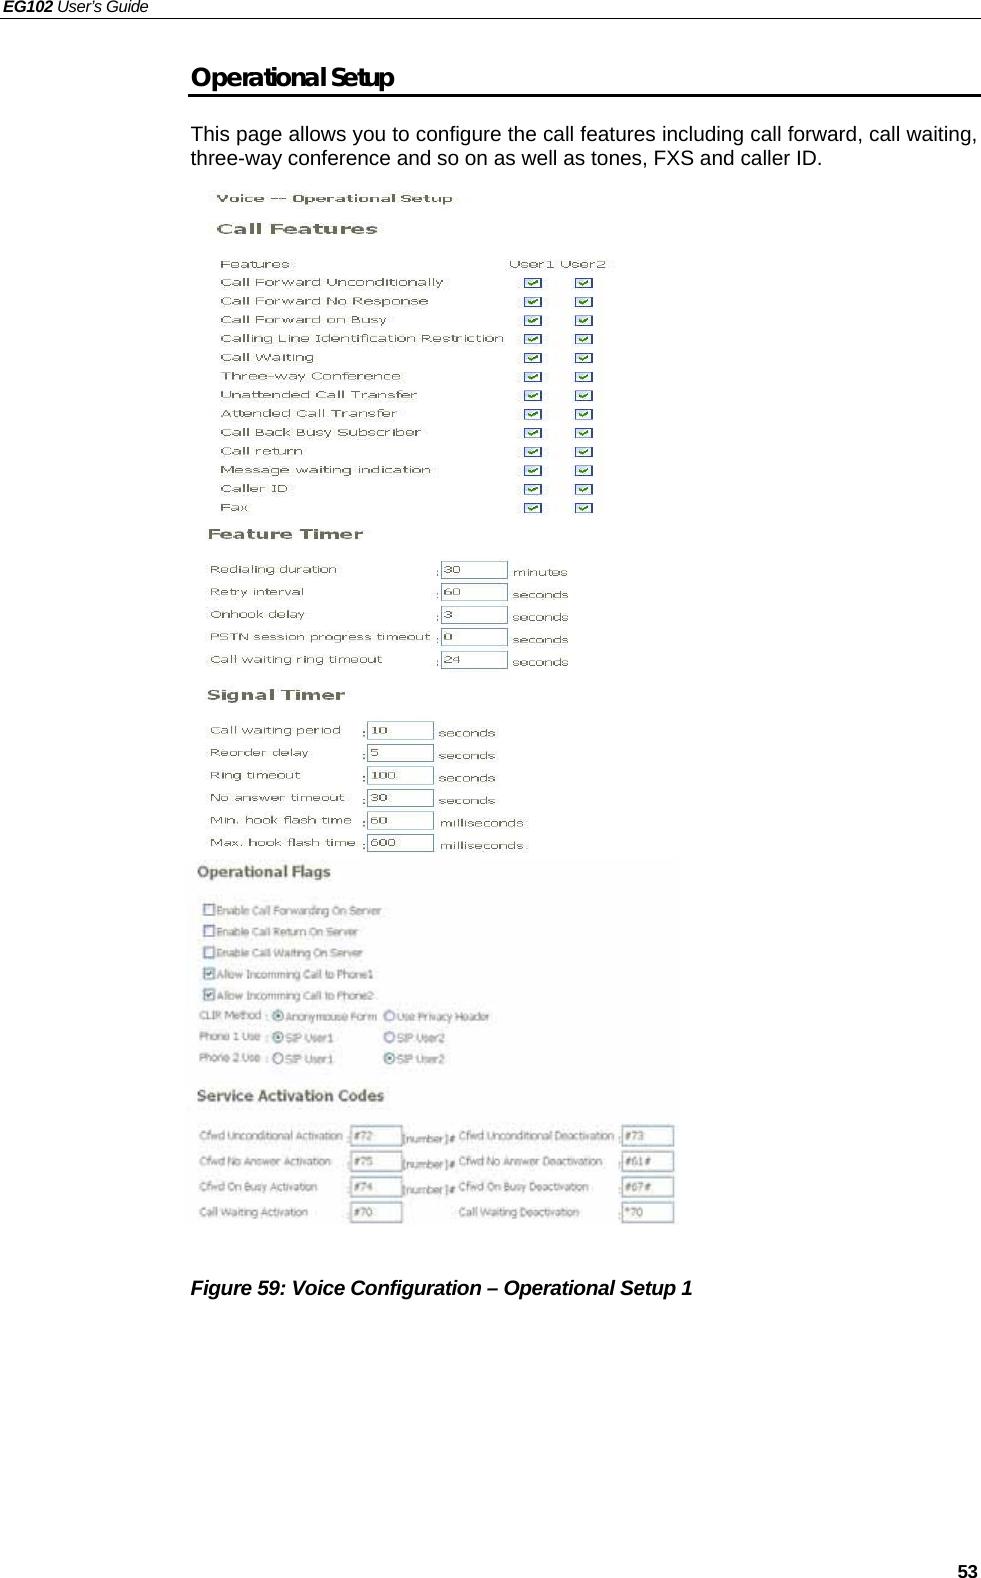 XAVi Technologies EG102 Gateway Router User Manual